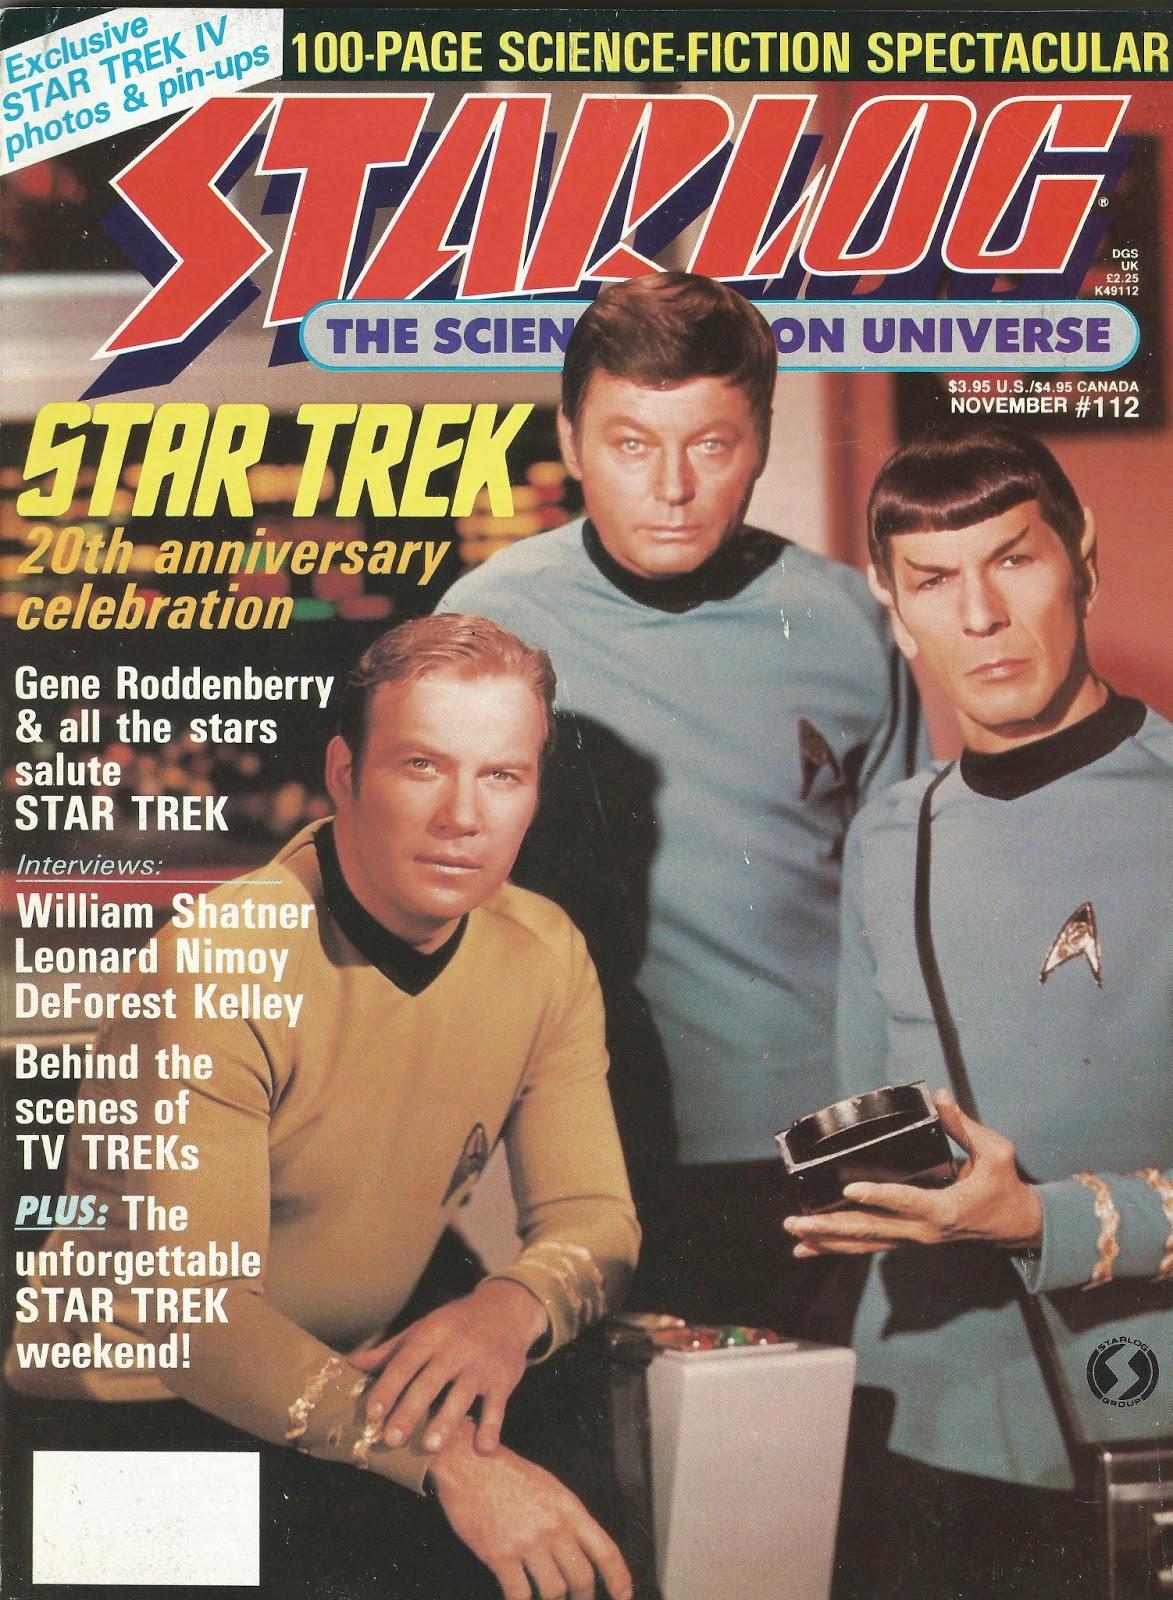 Four 8 x 10 color photos STAR TREK 1985 Gene Roddenberry Star Ceremony